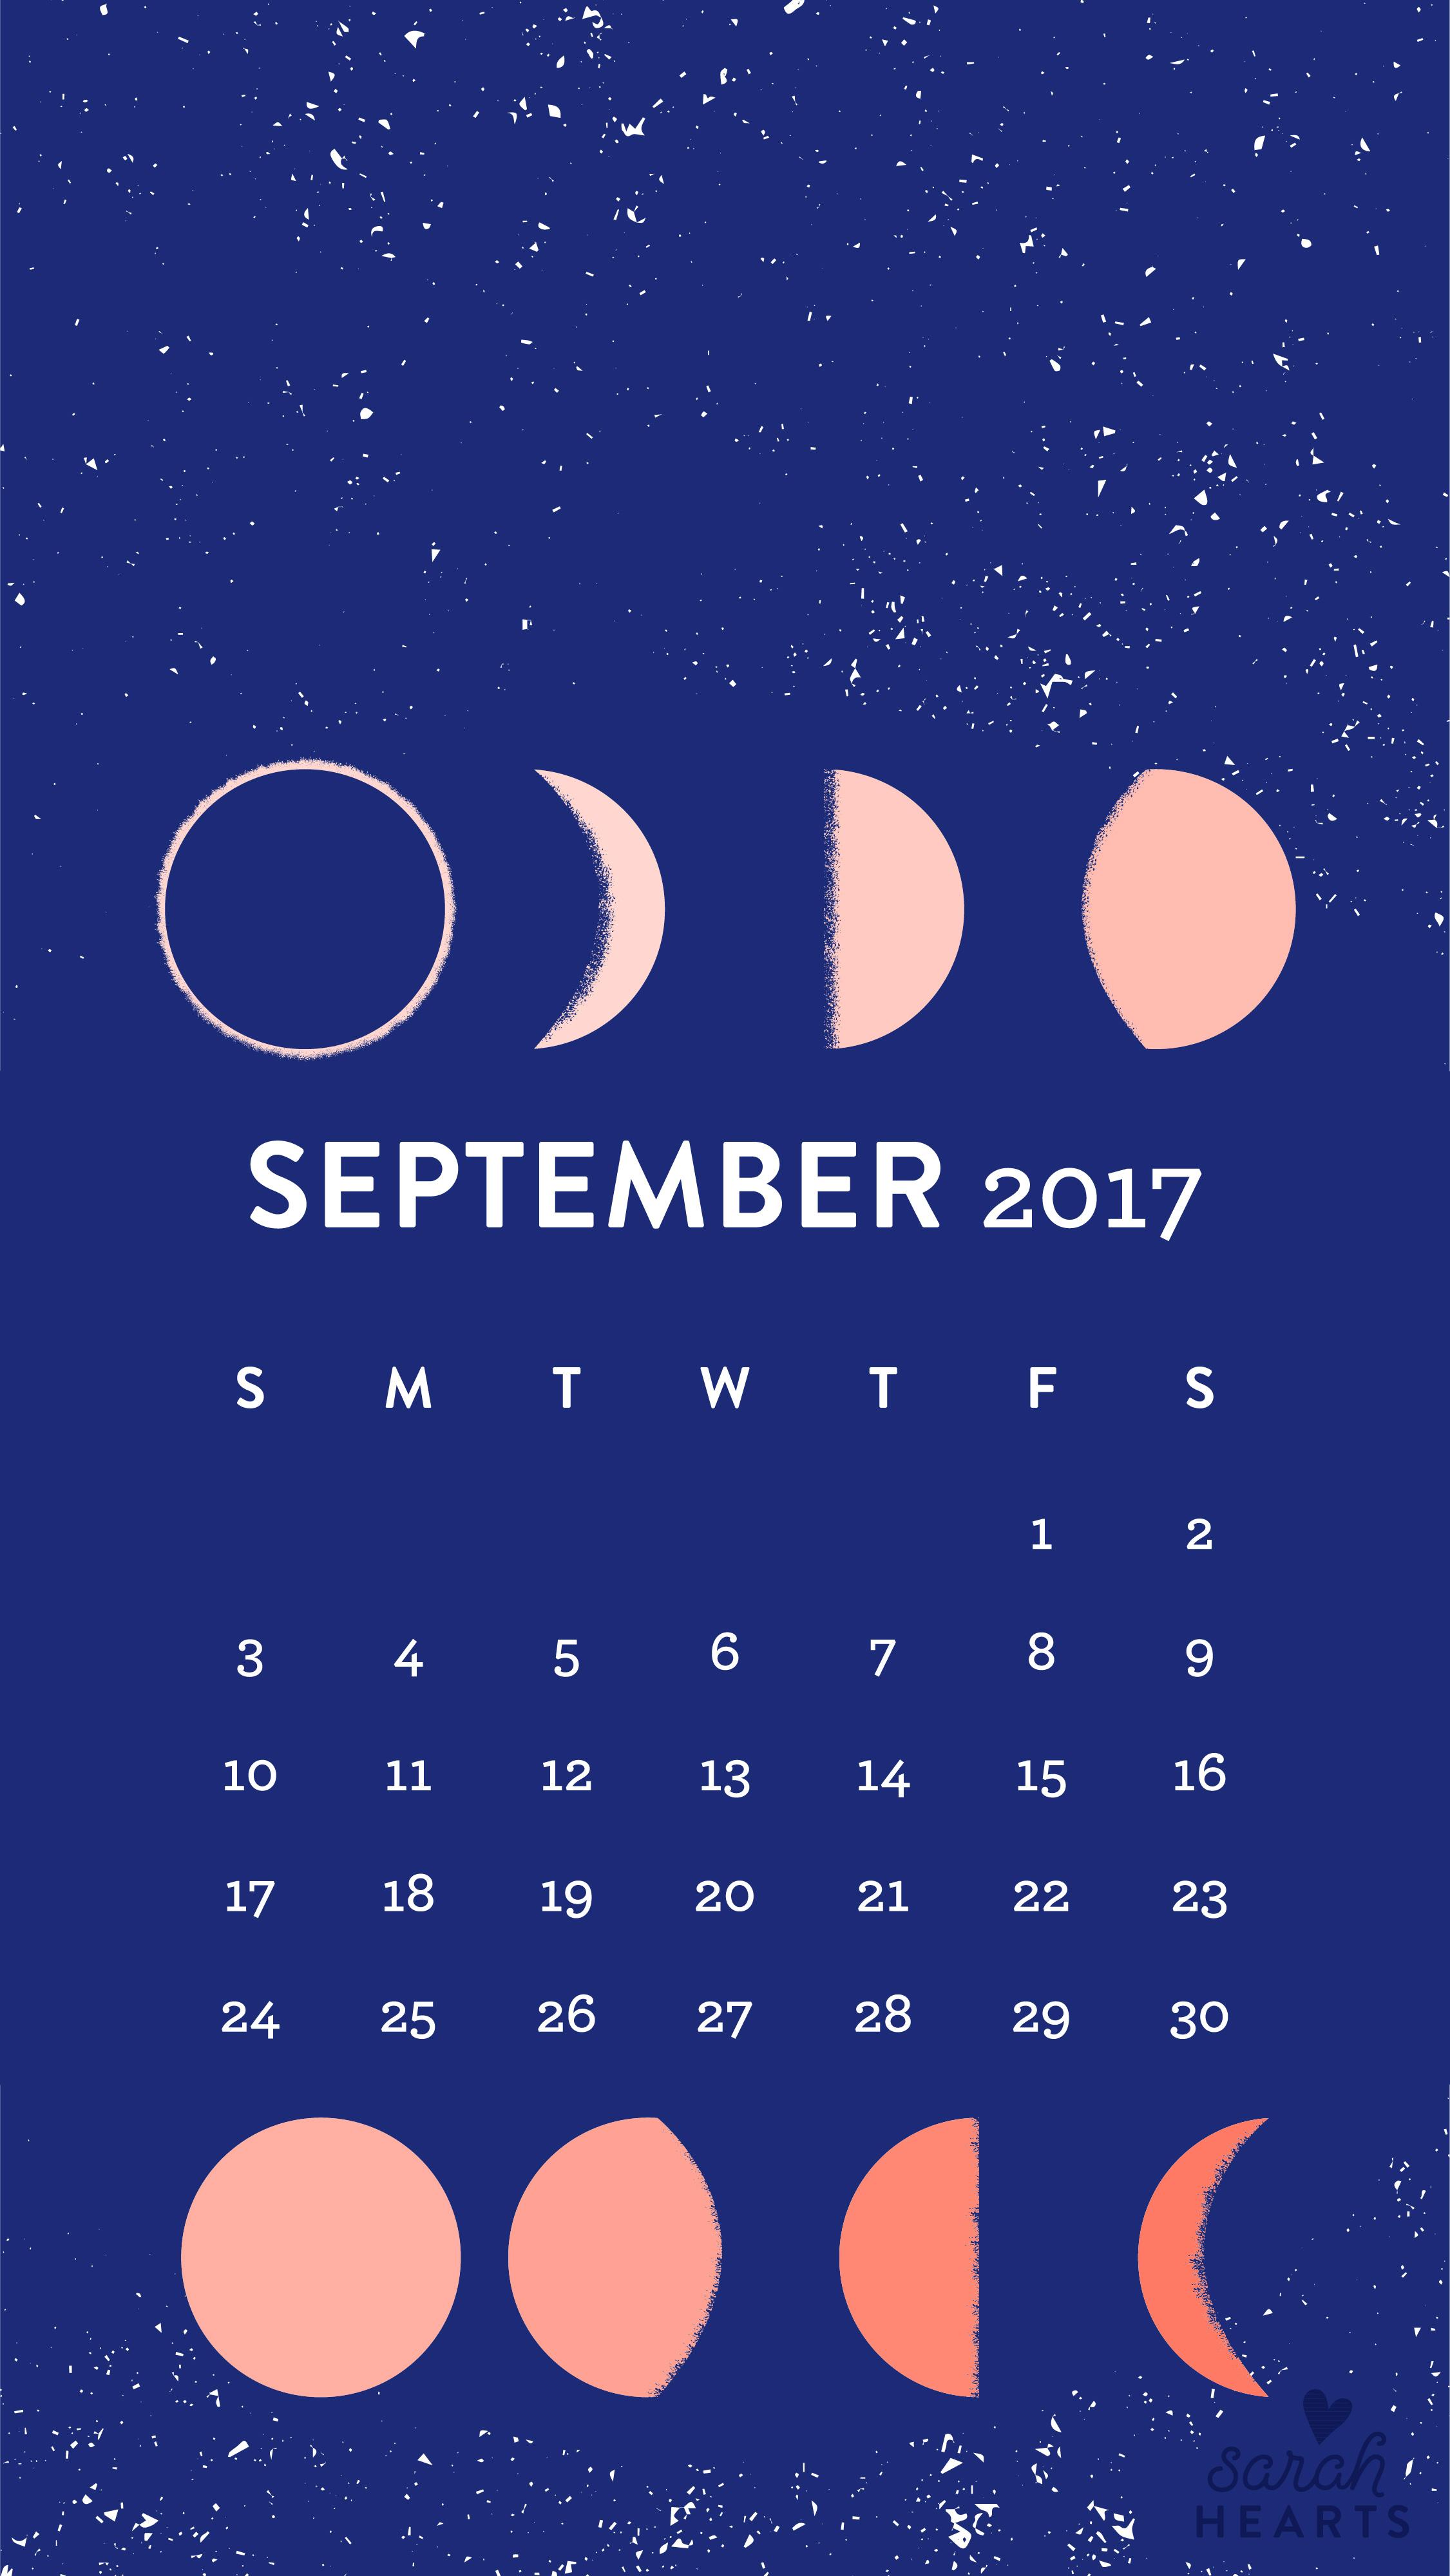 September 2017 Calendar Wallpaper Sarah Hearts